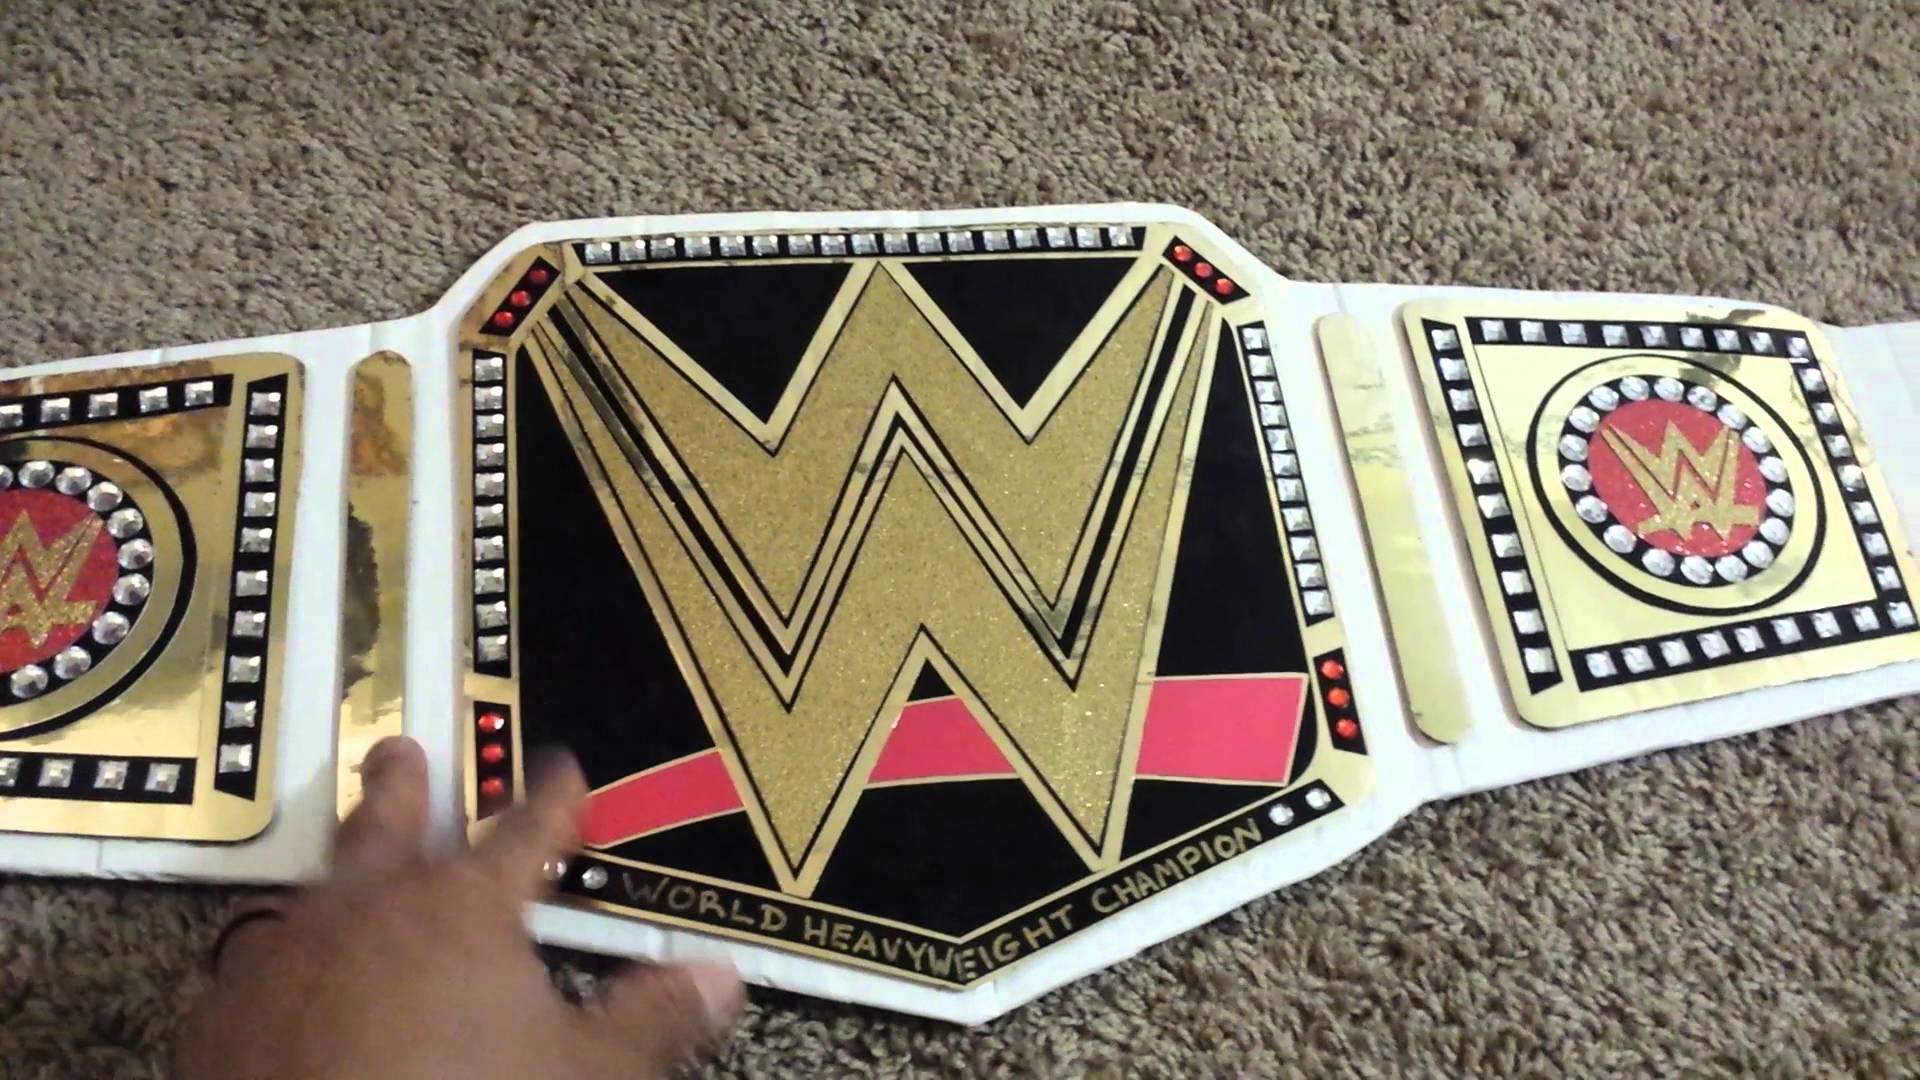 1920x1080 TUTORIAL HOW TO MAKE THE WWE WORLD HEAVYWEIGHT CHAMPIONSHIP